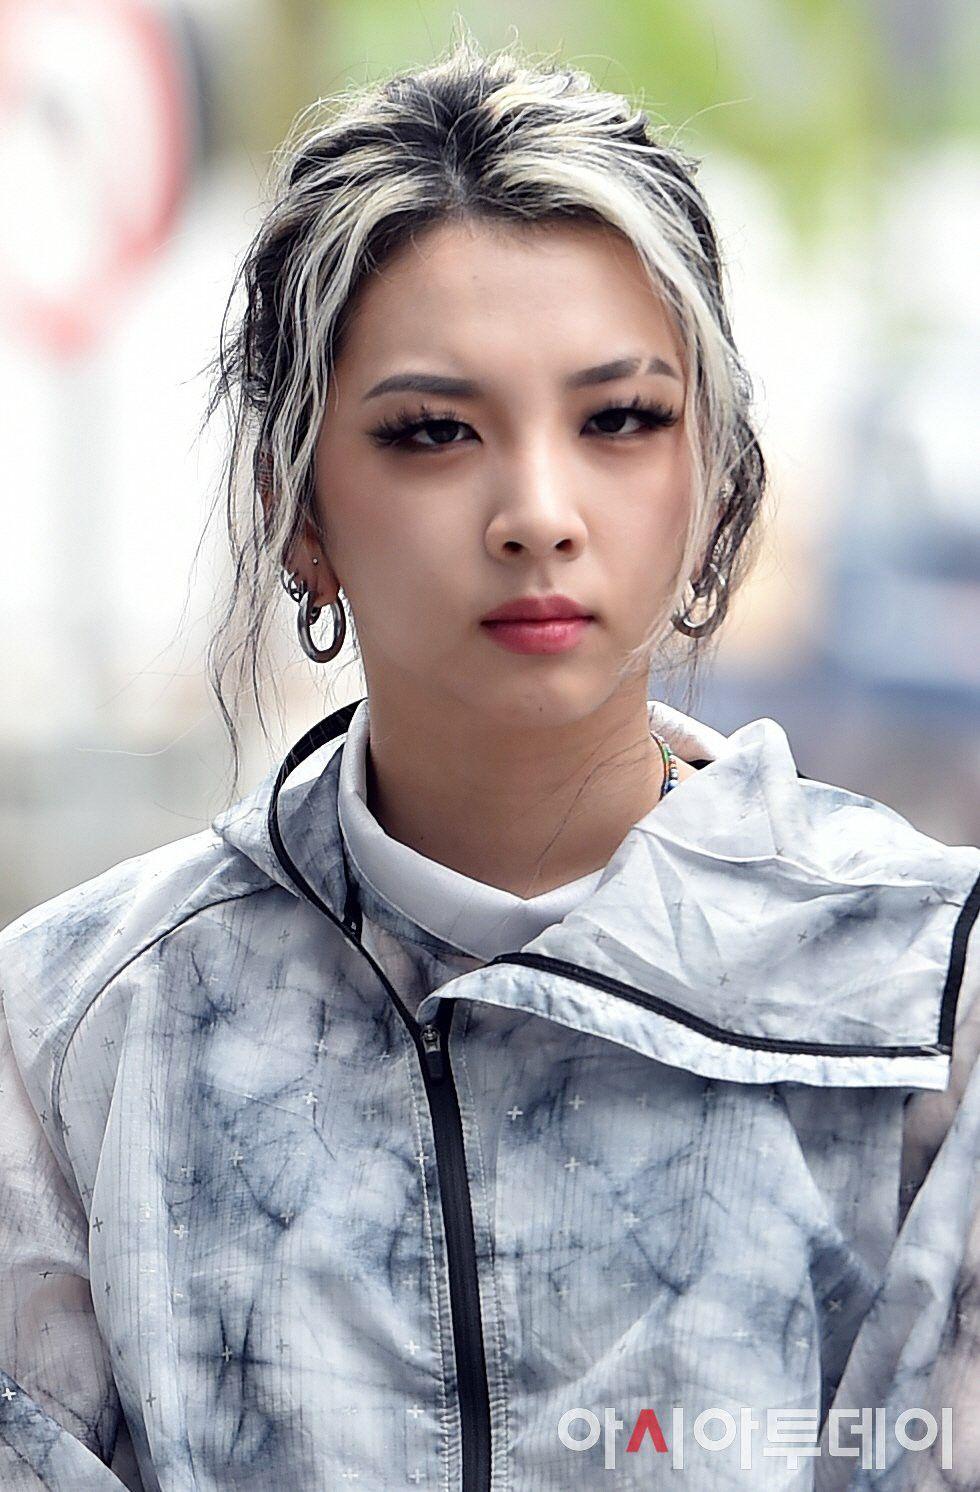 Pin By Sarah Kim On K Rd White Streak In Hair Grunge Hair Hair Streaks